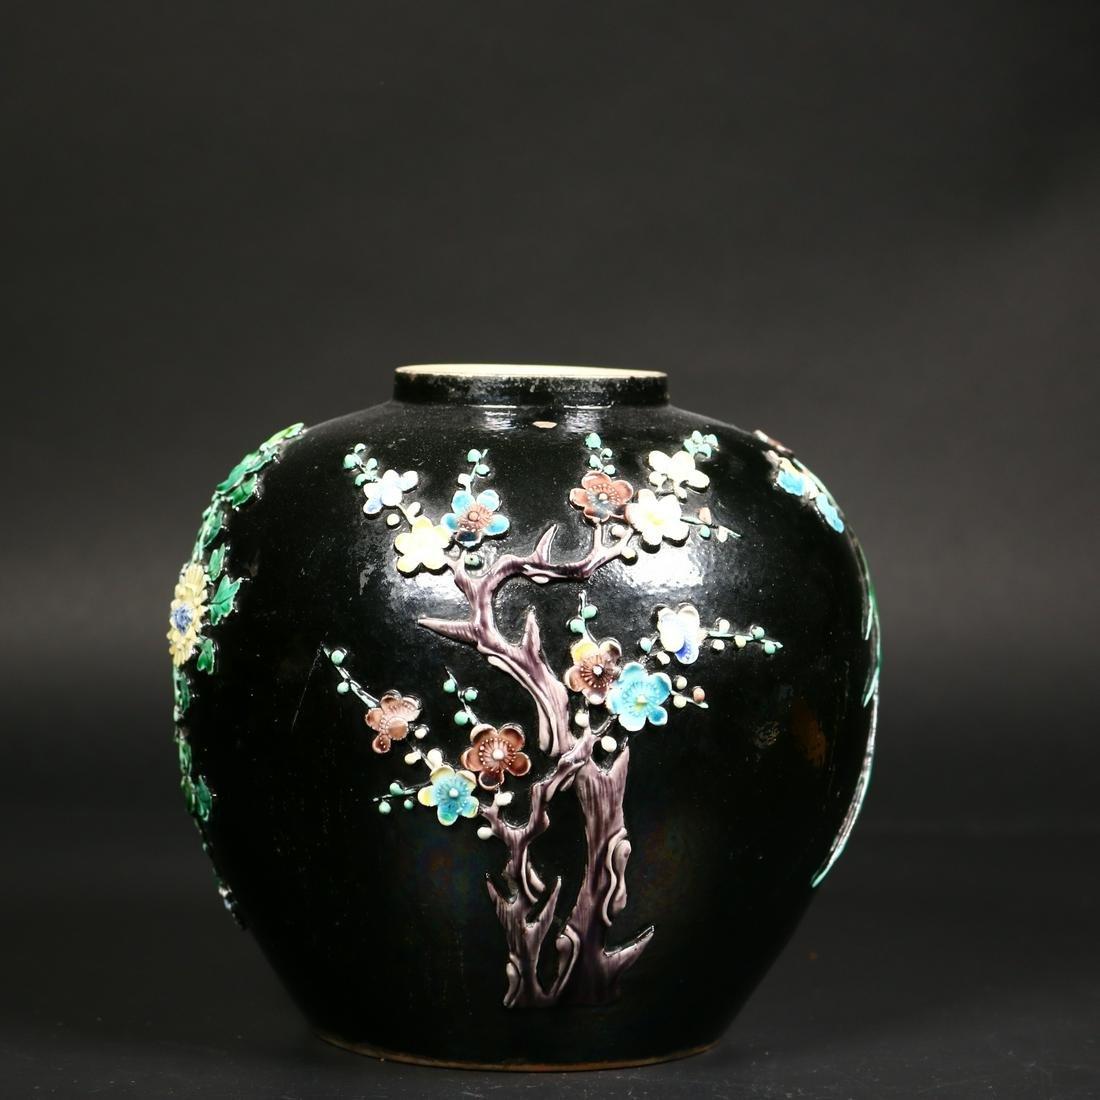 Qing Dynasty Porcelain Vase By Wang Bin Rong